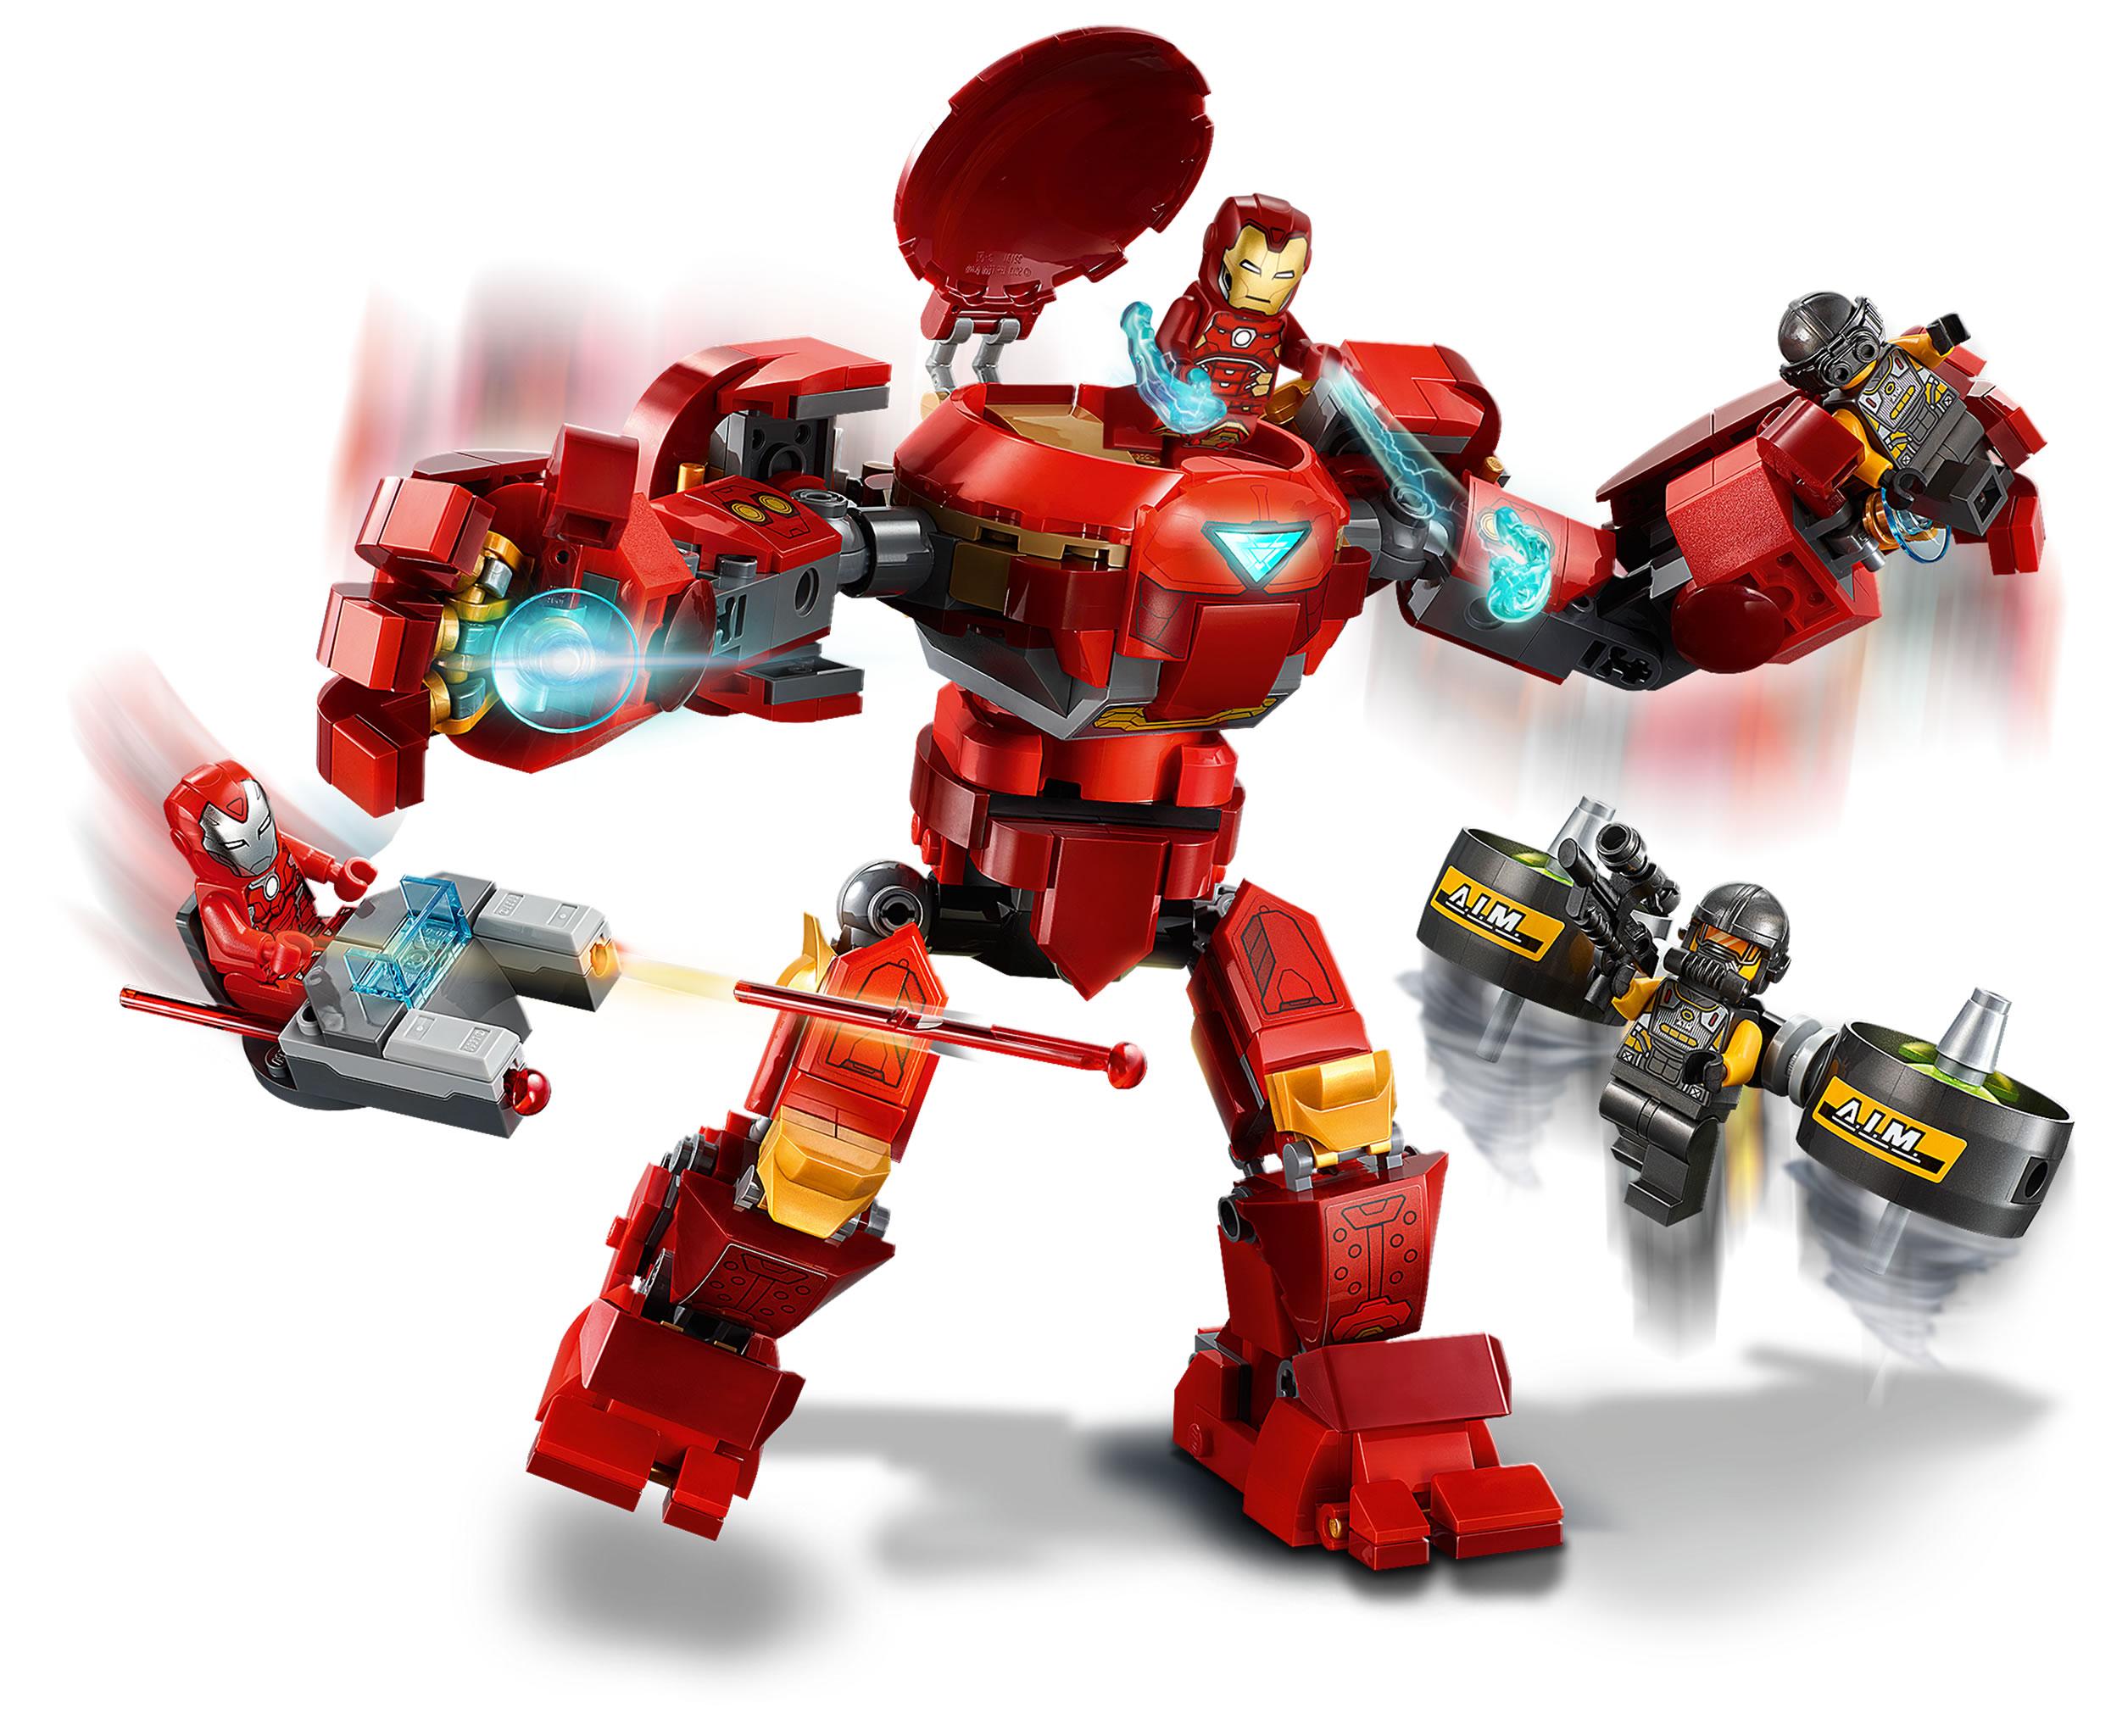 76164-lego-marvel-iron-man-hulkbuster-versus-aim-agent-2020-1 zusammengebaut.com